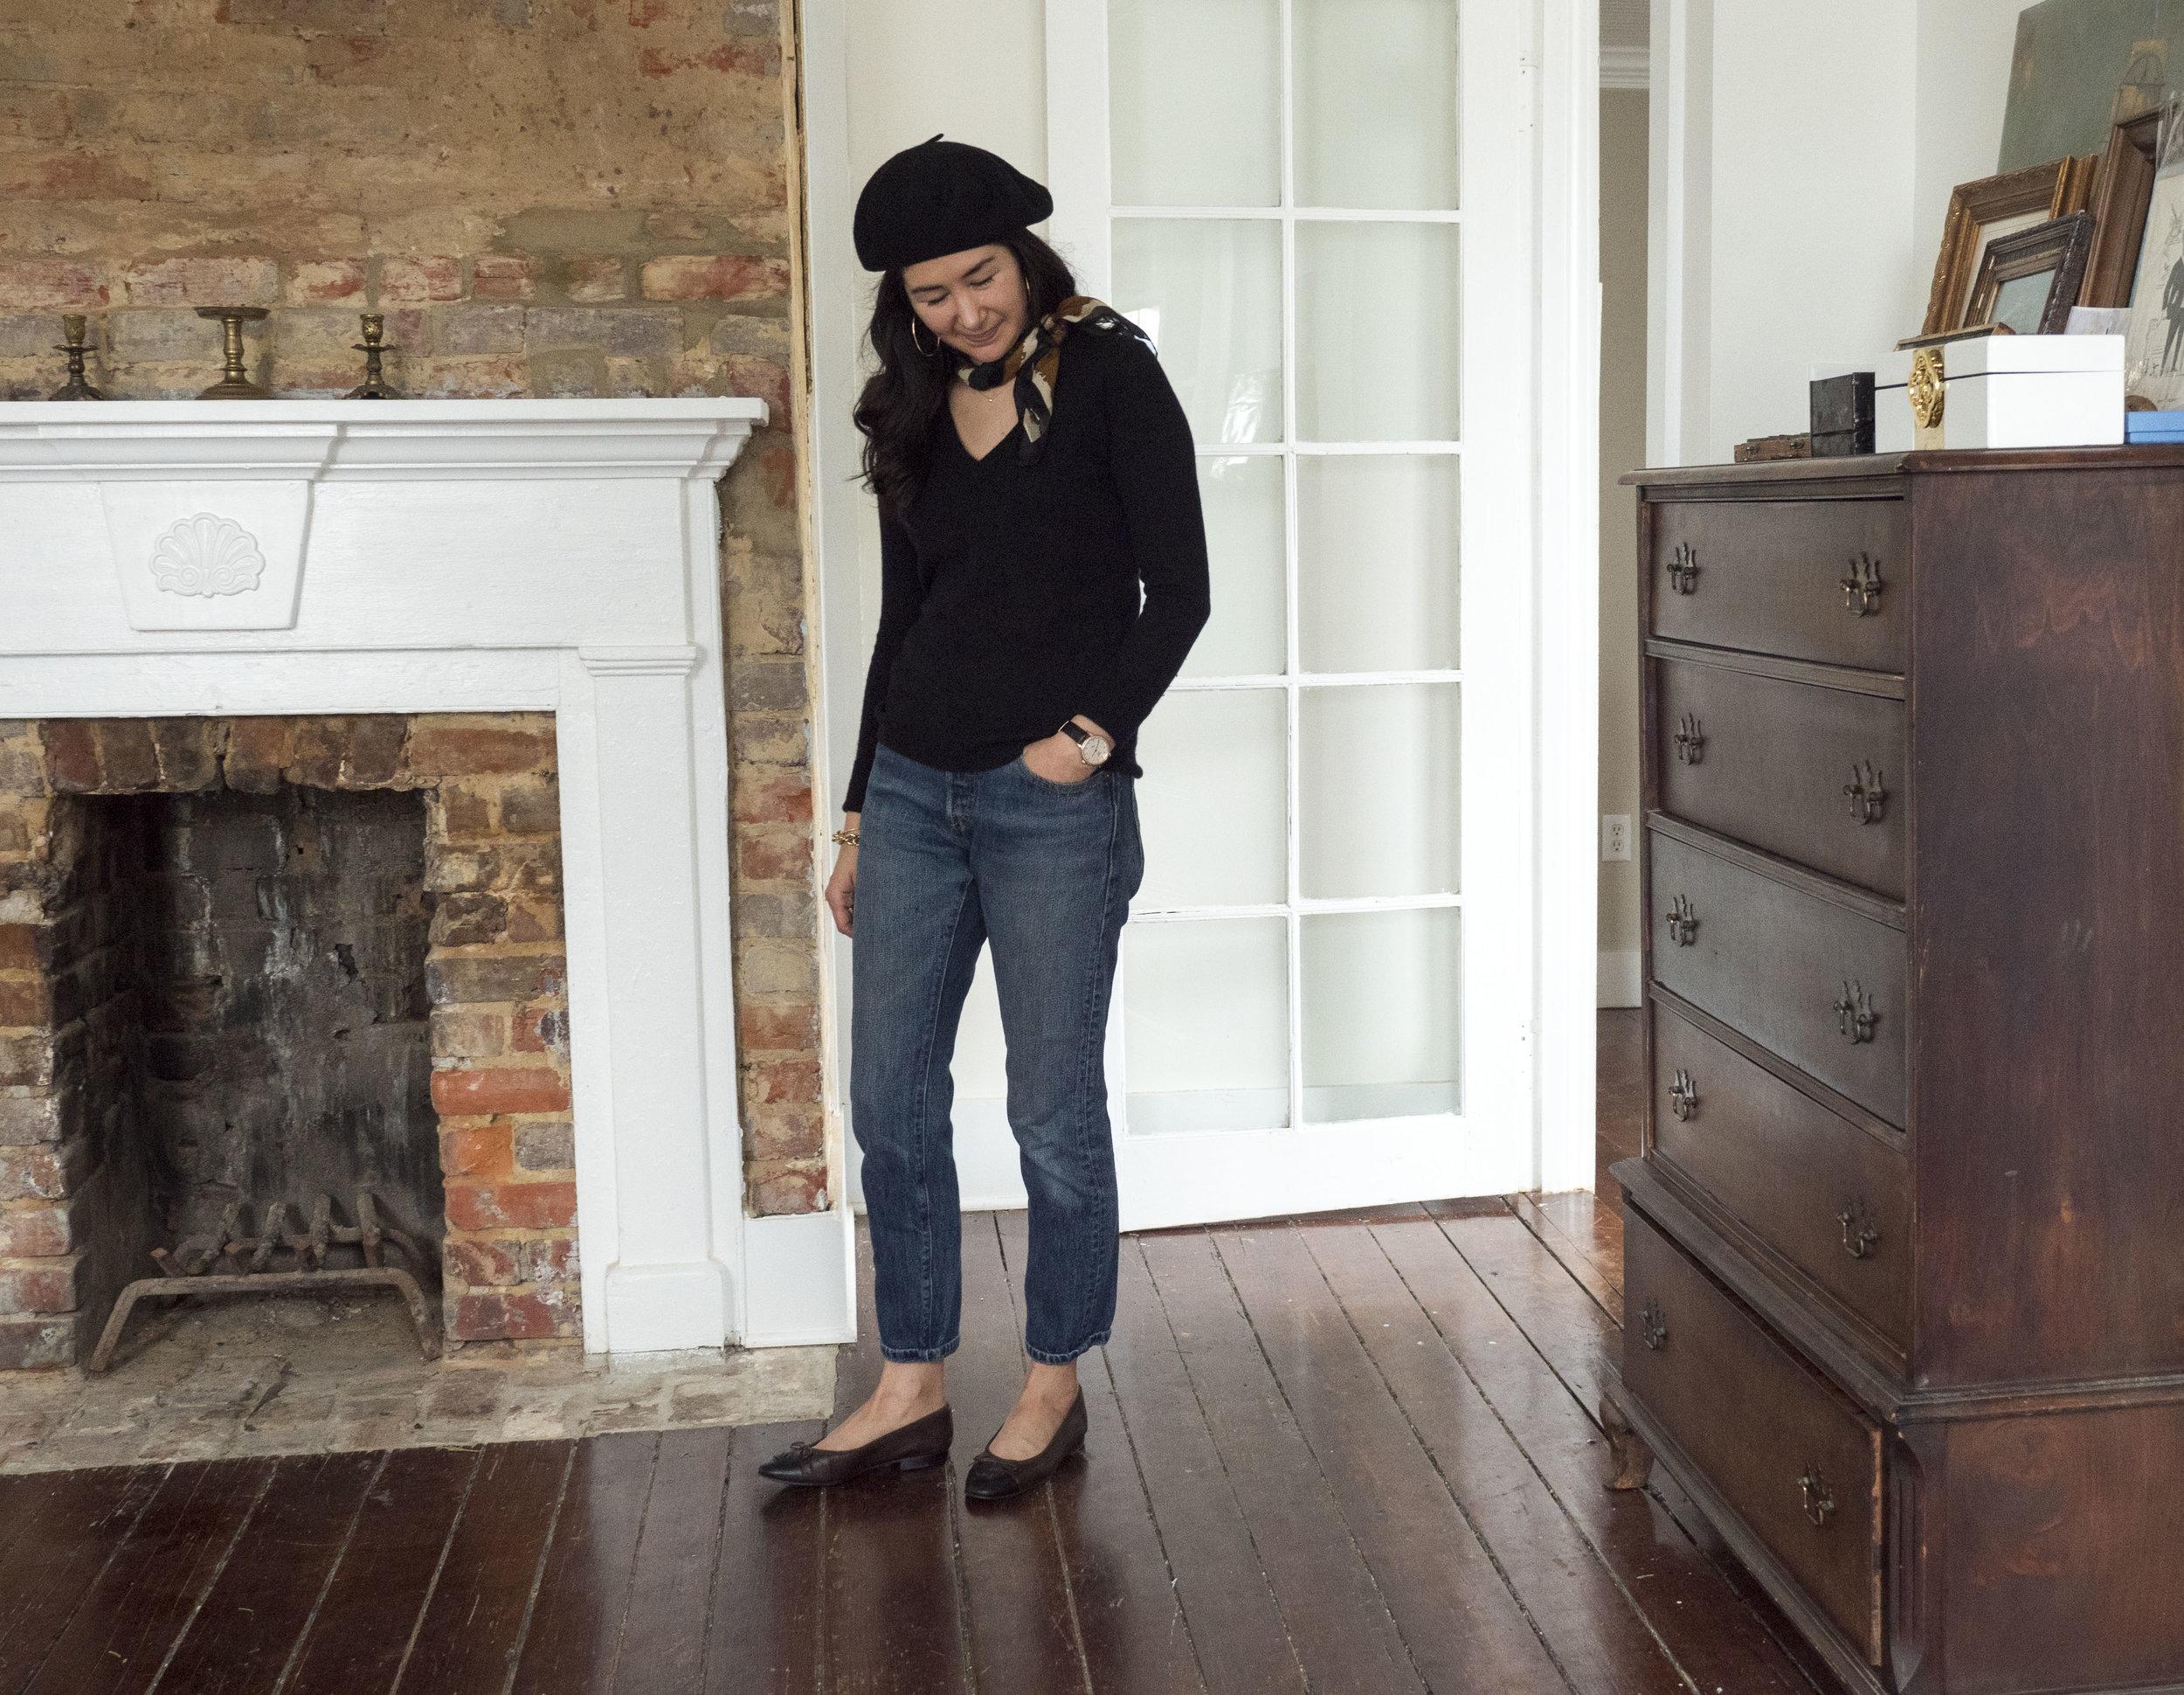 _1022164audrey_a_la_mode_mejuri-camel-coat-everlane-jeans-jacy-watch-chanel-ballet-flats-round-sunglasses-beret-everlane-cashmere.JPG